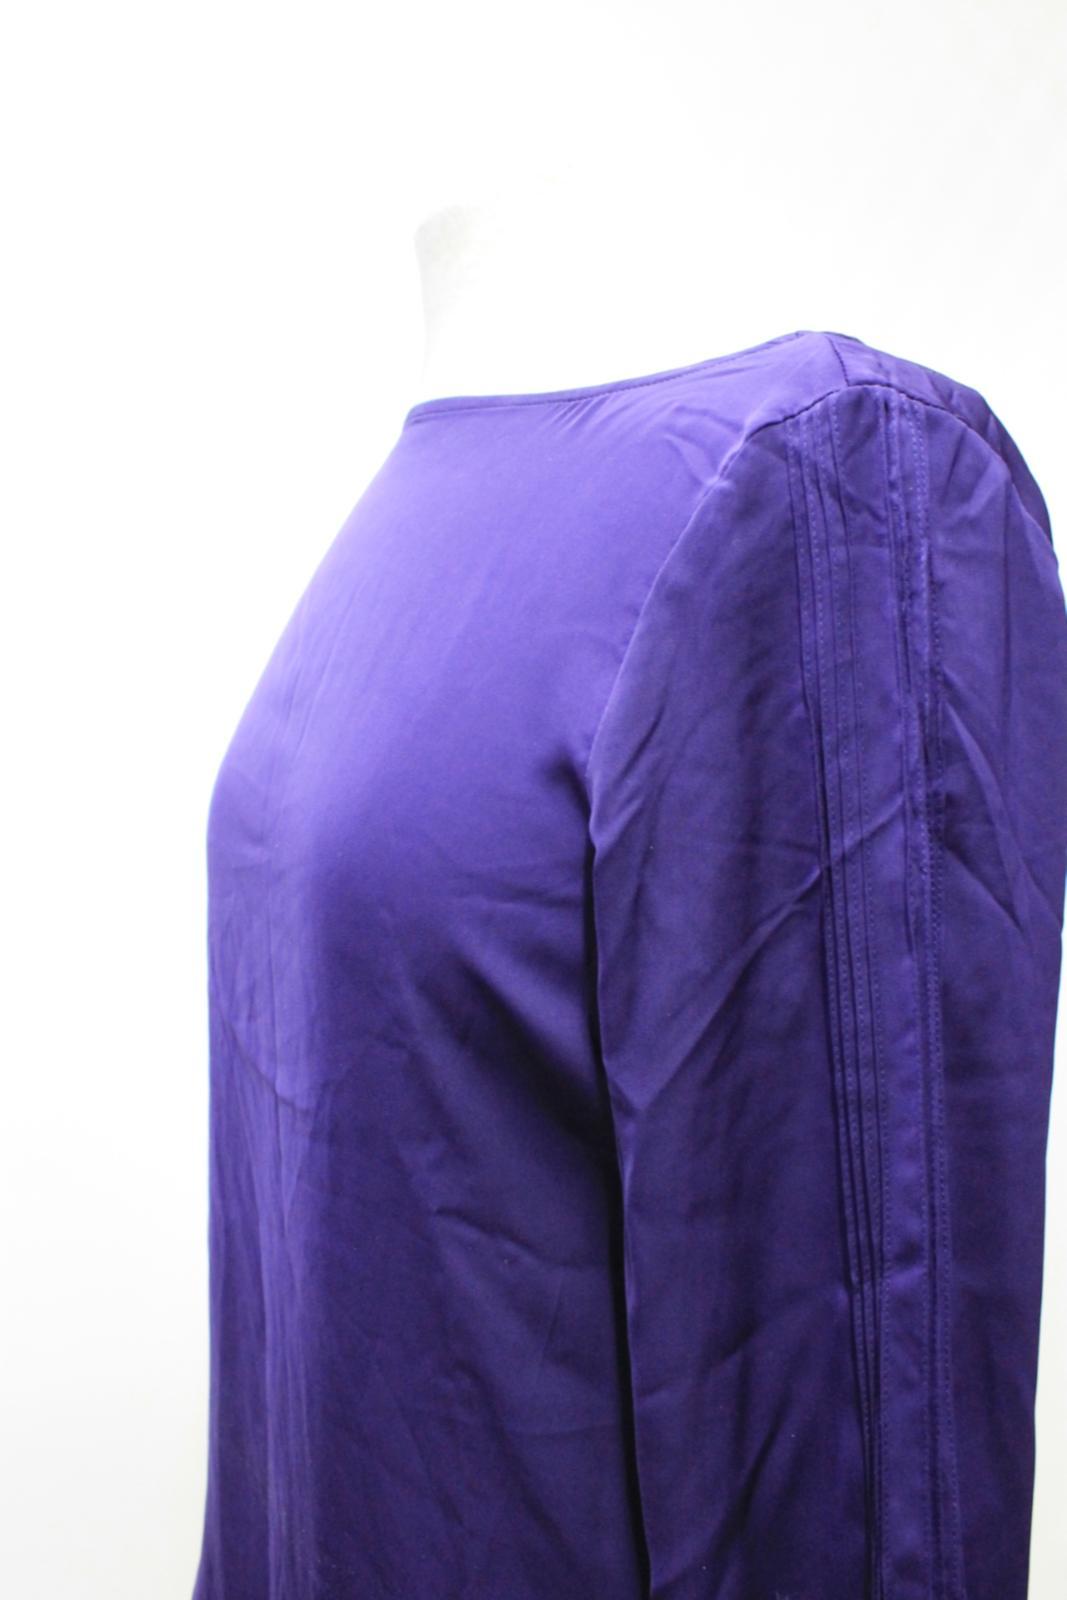 LAUREN-BY-RALPH-LAUREN-Ladies-Purple-Satin-Pleated-Sleeve-Round-Neck-Top-S thumbnail 6